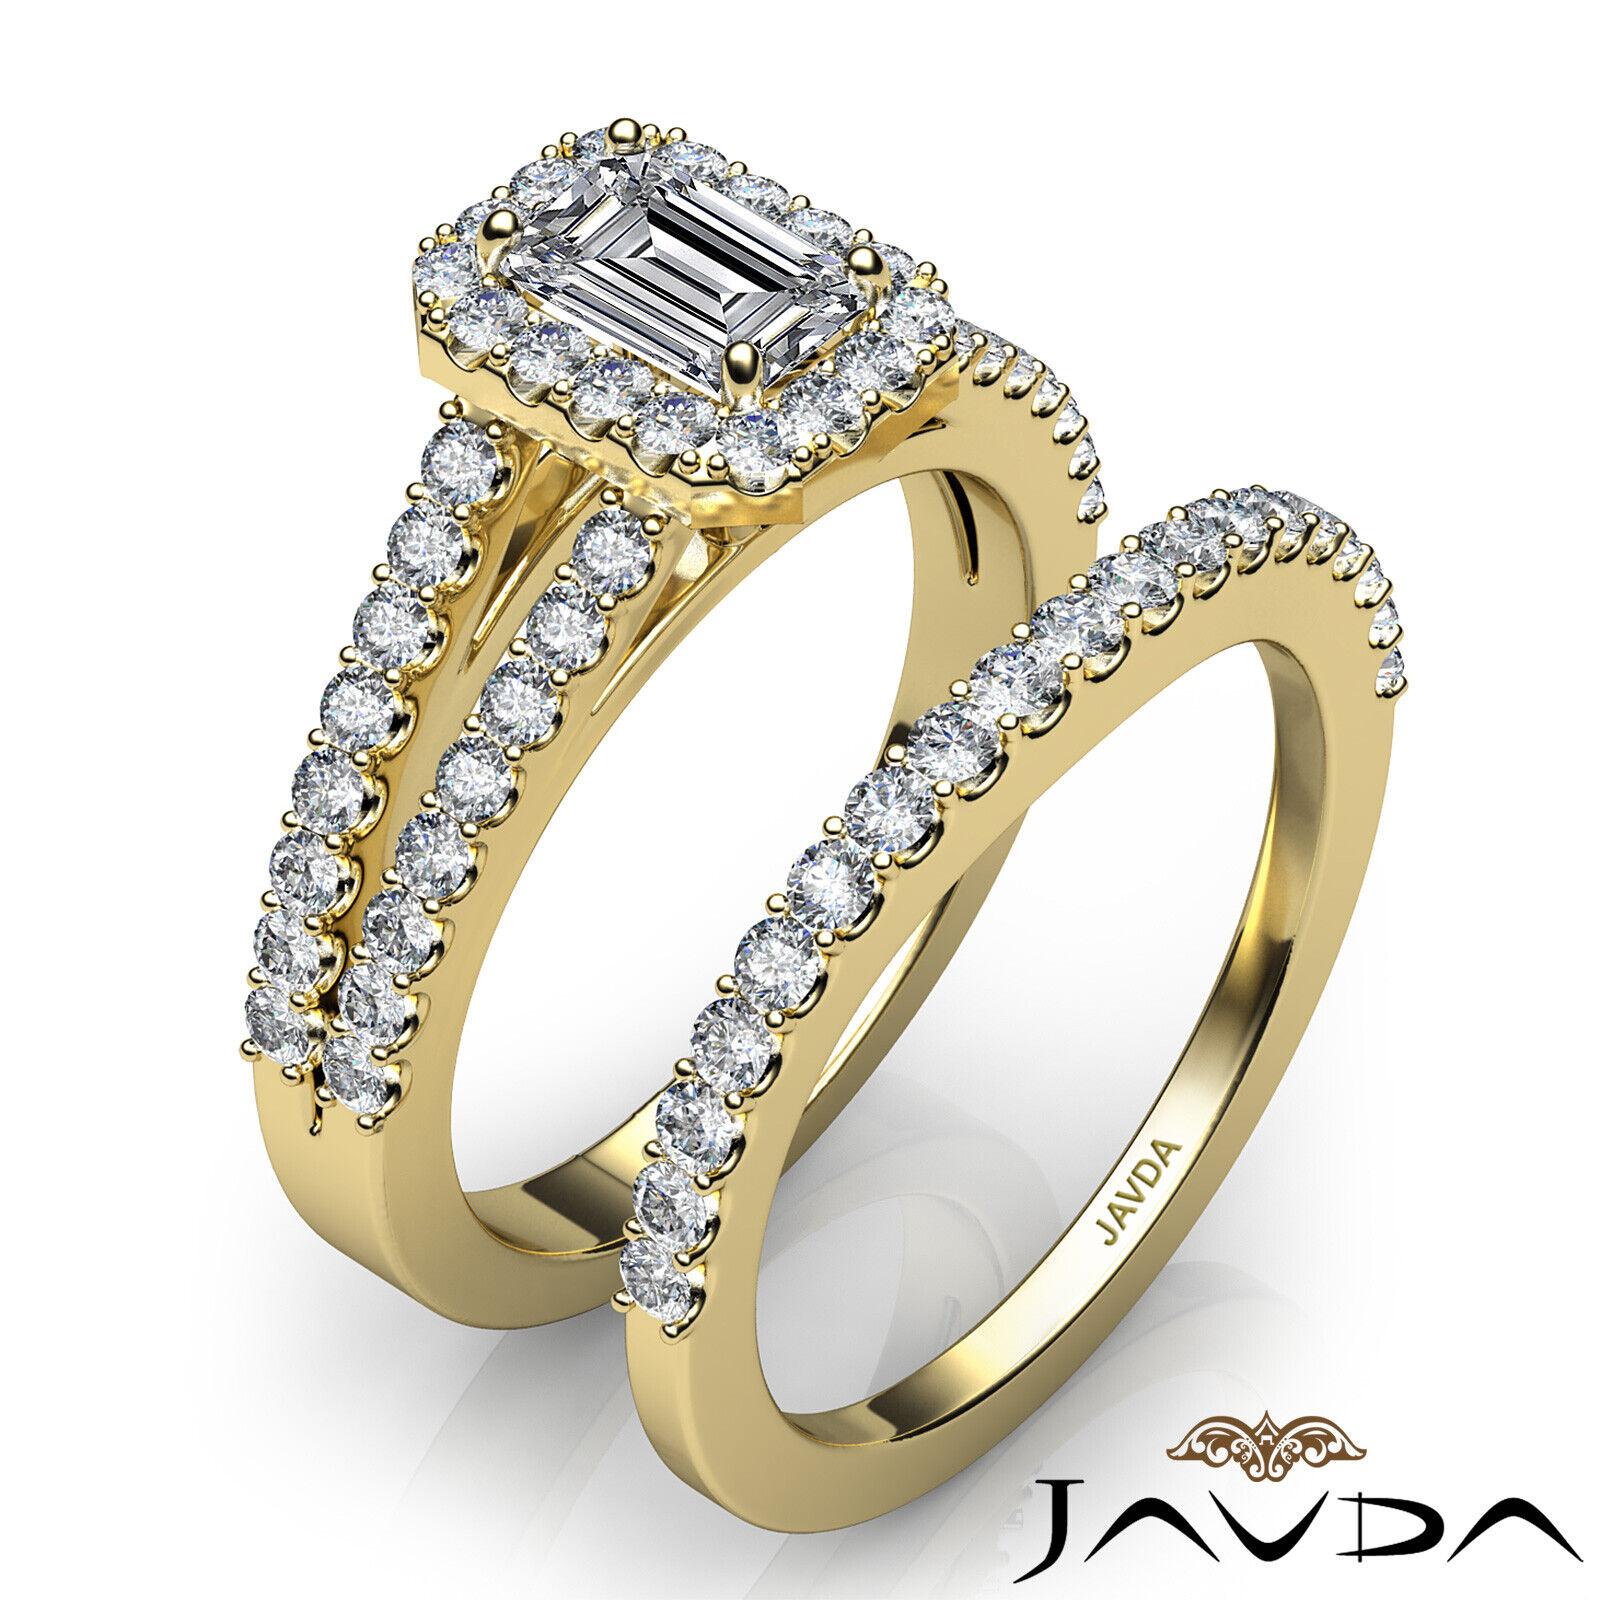 1.75ctw Halo Sidestone Bridal Emerald Diamond Engagement Ring GIA H-VS2 W Gold 10